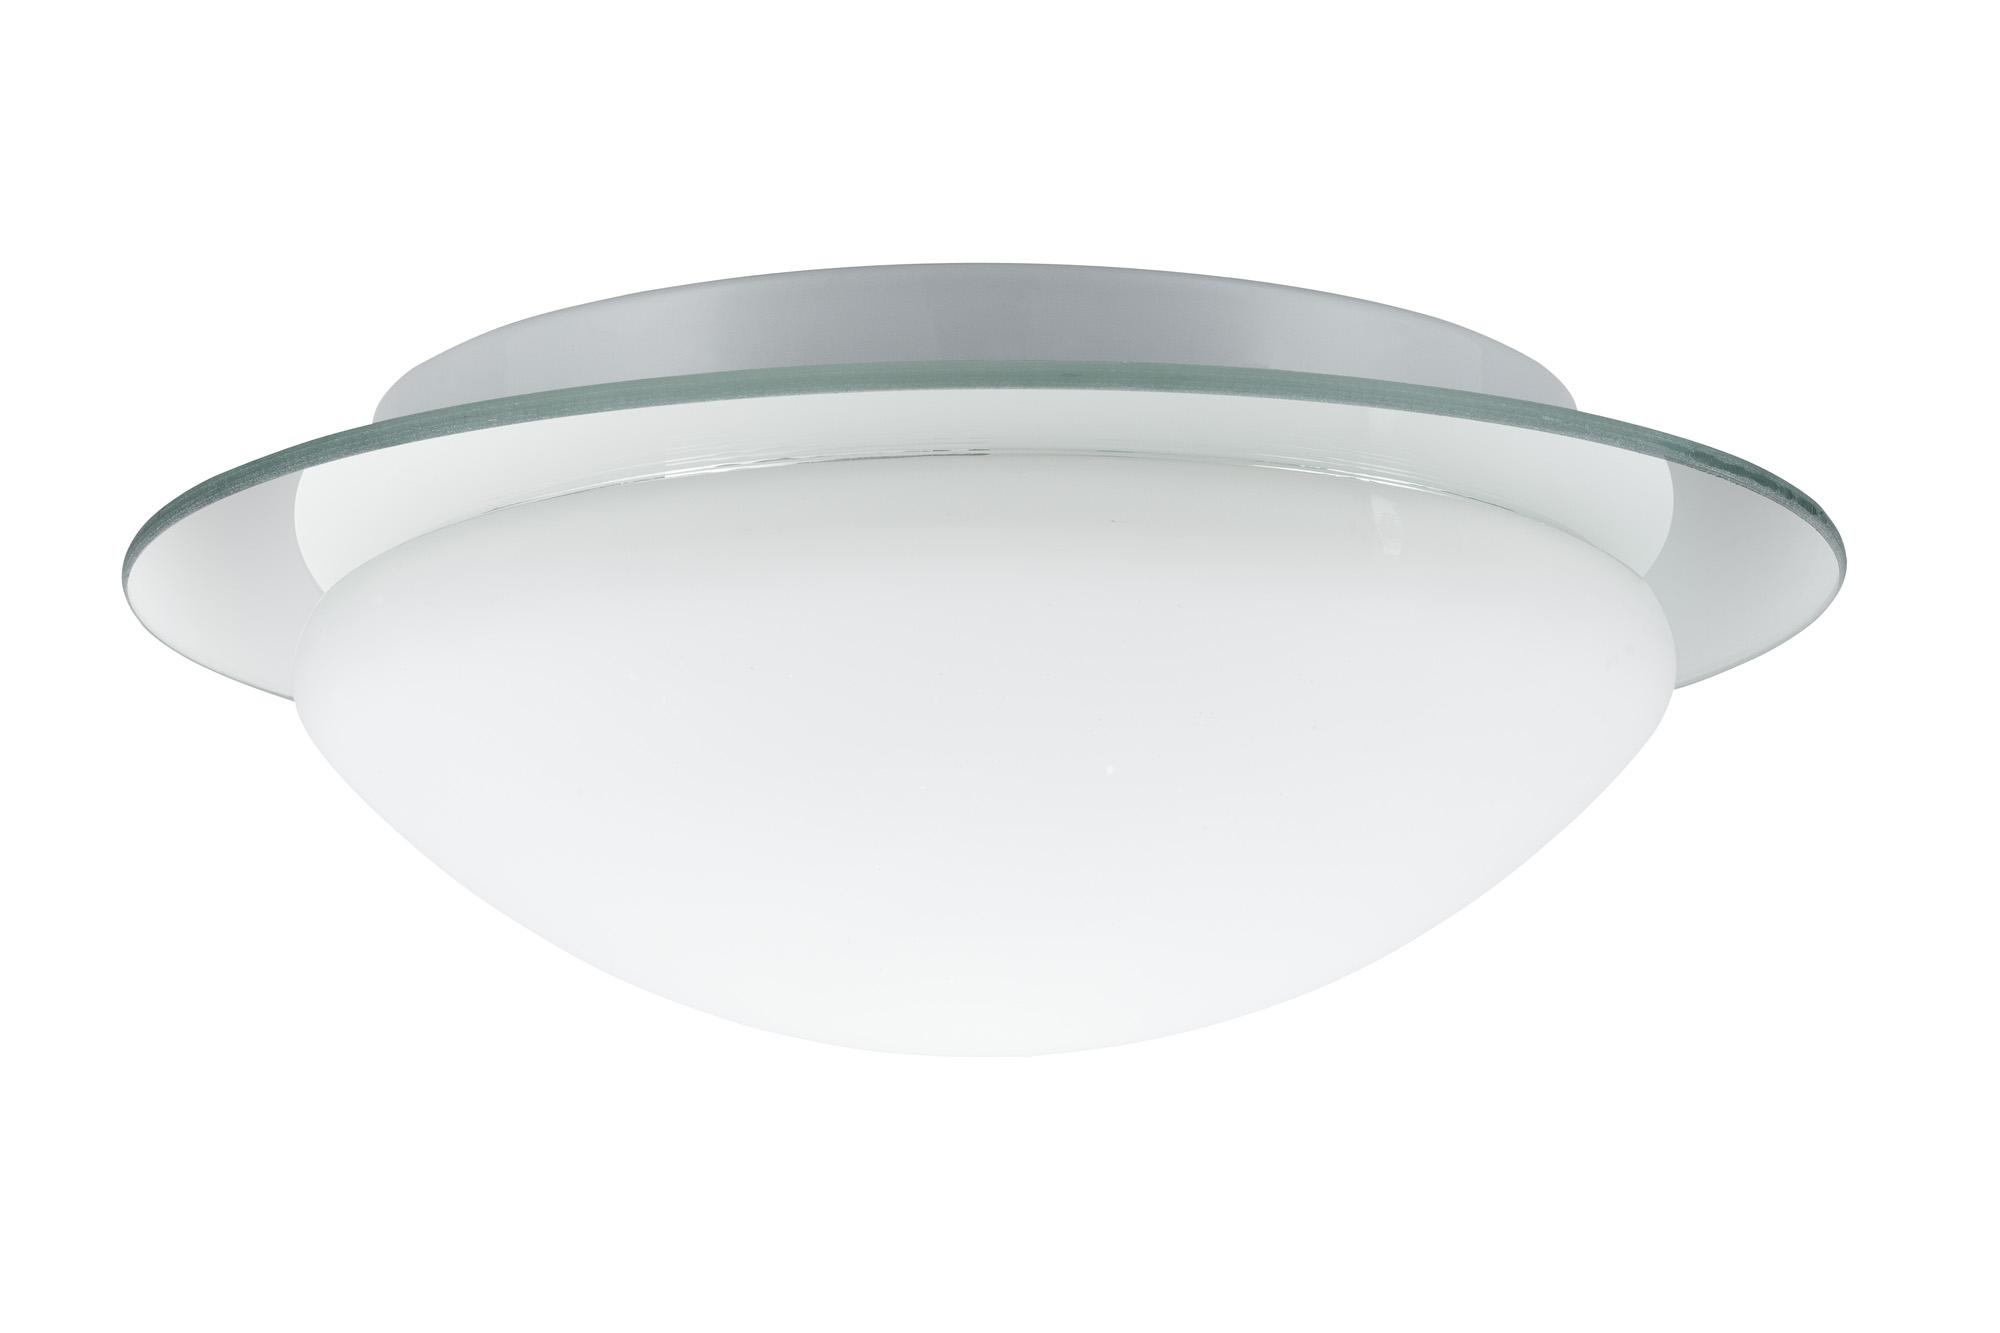 Plafonnier salle de bain paulmann mirfak ip44 max 40w 230v for Lampe plafonnier salle de bain